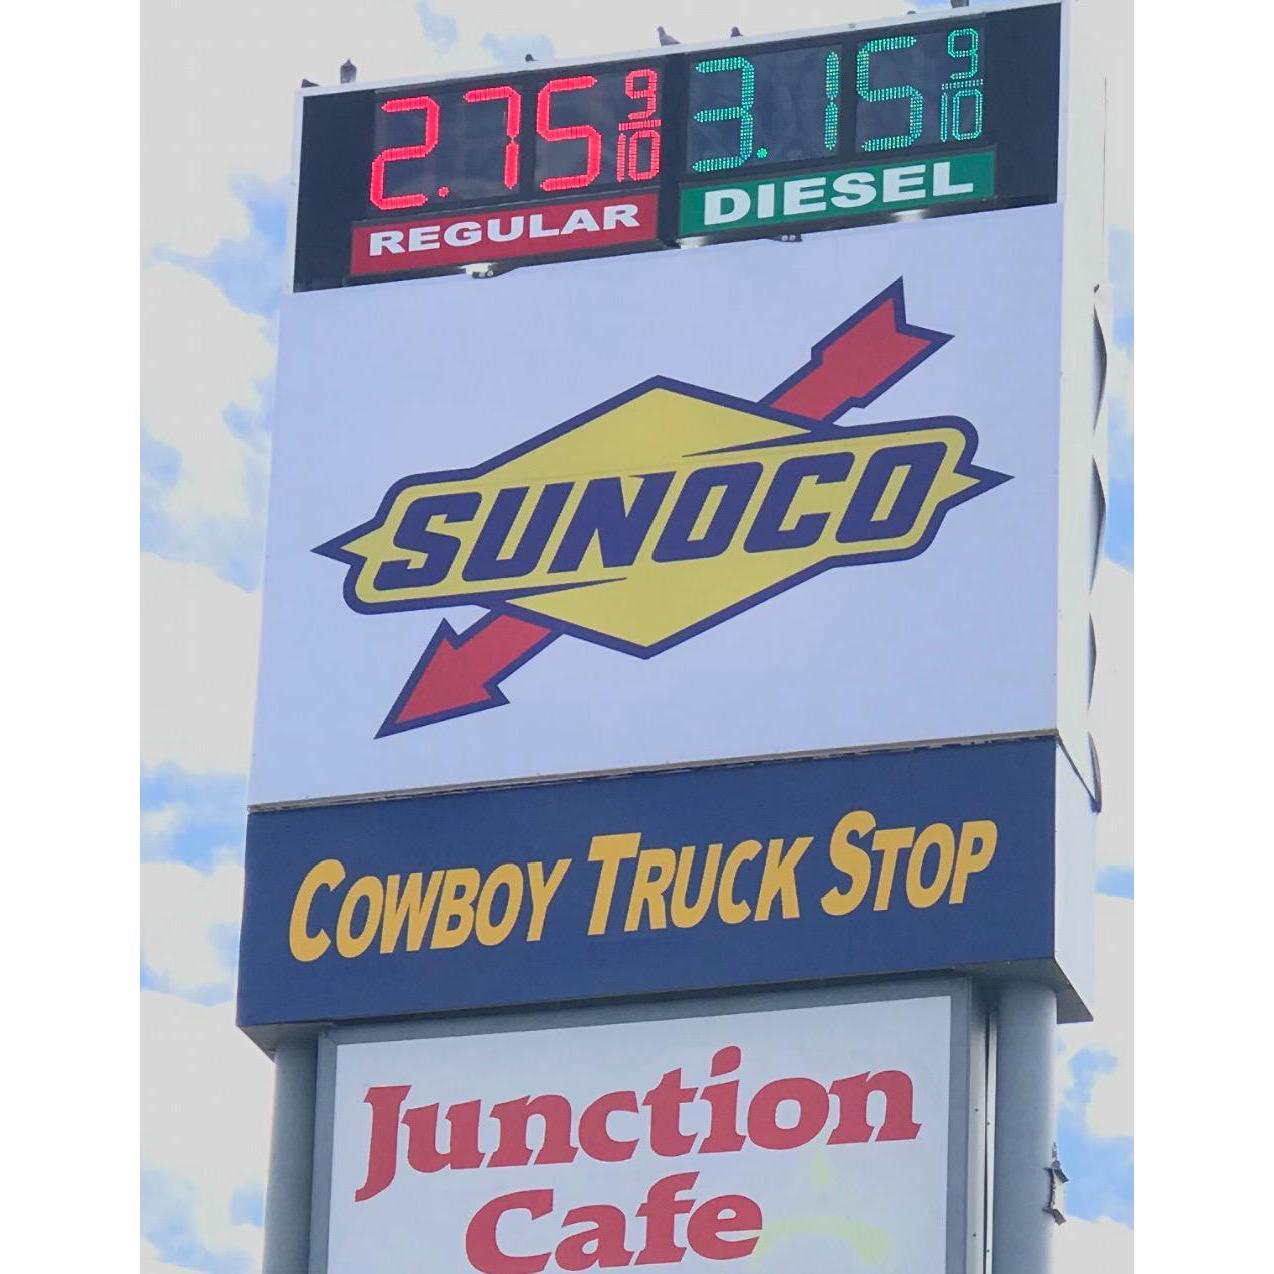 CowBoy Truck Stop - Sunoco image 5